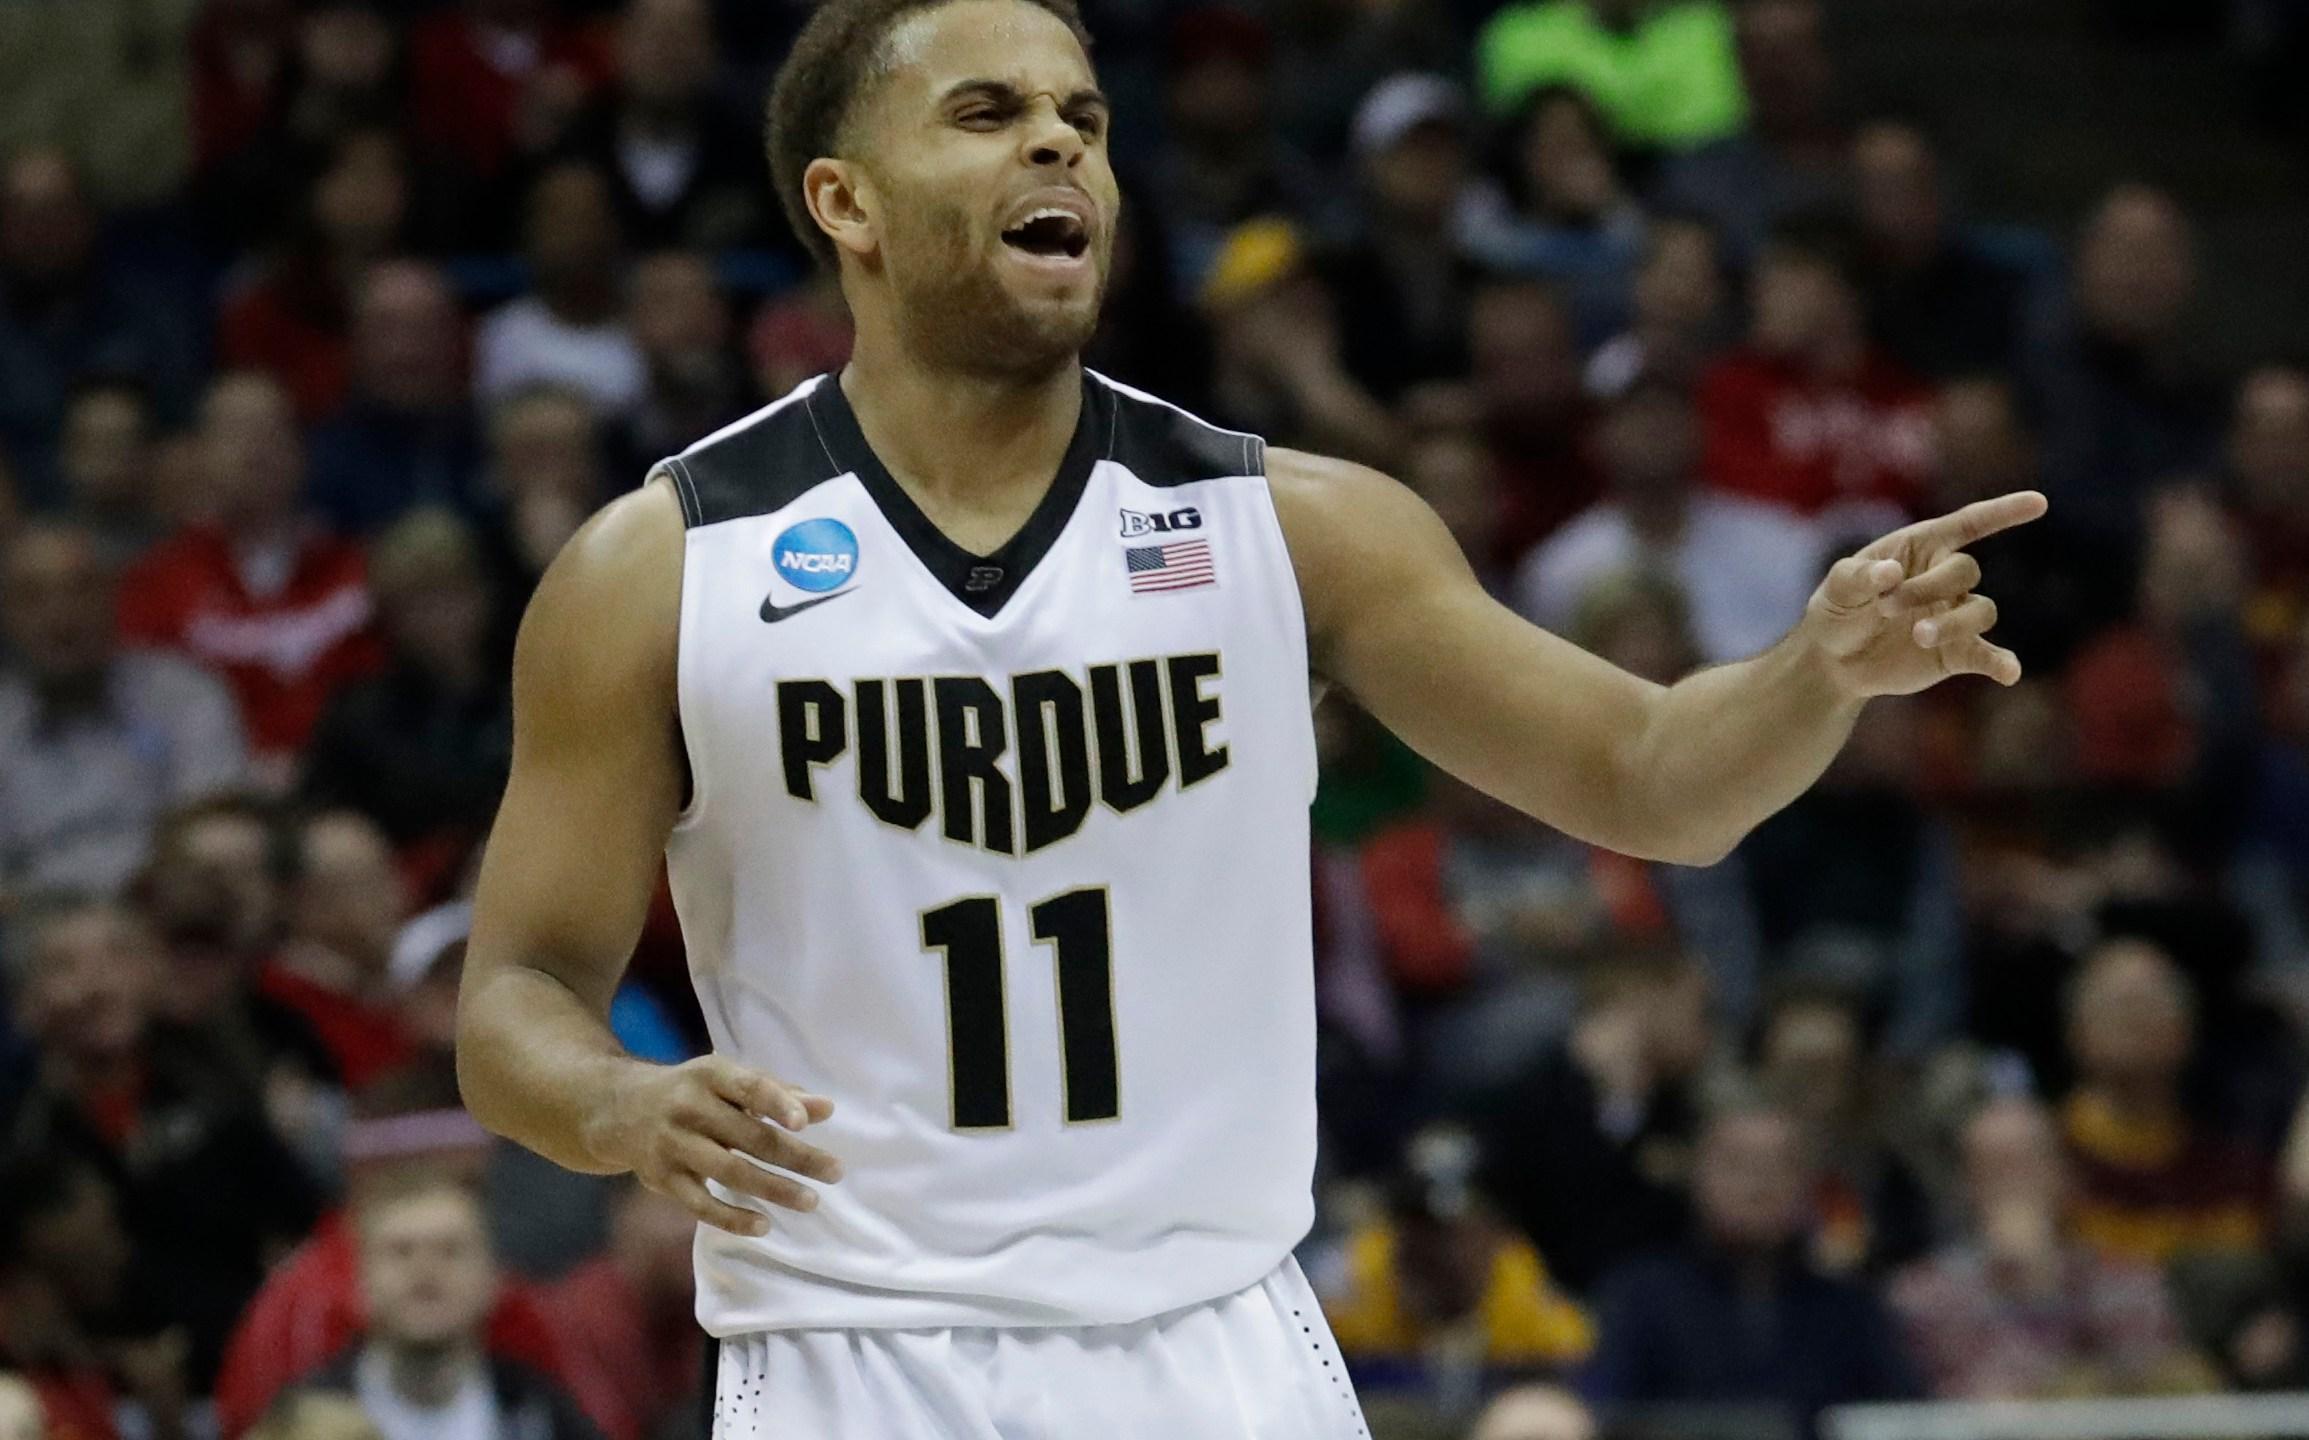 NCAA Vermont Purdue Basketball_248500